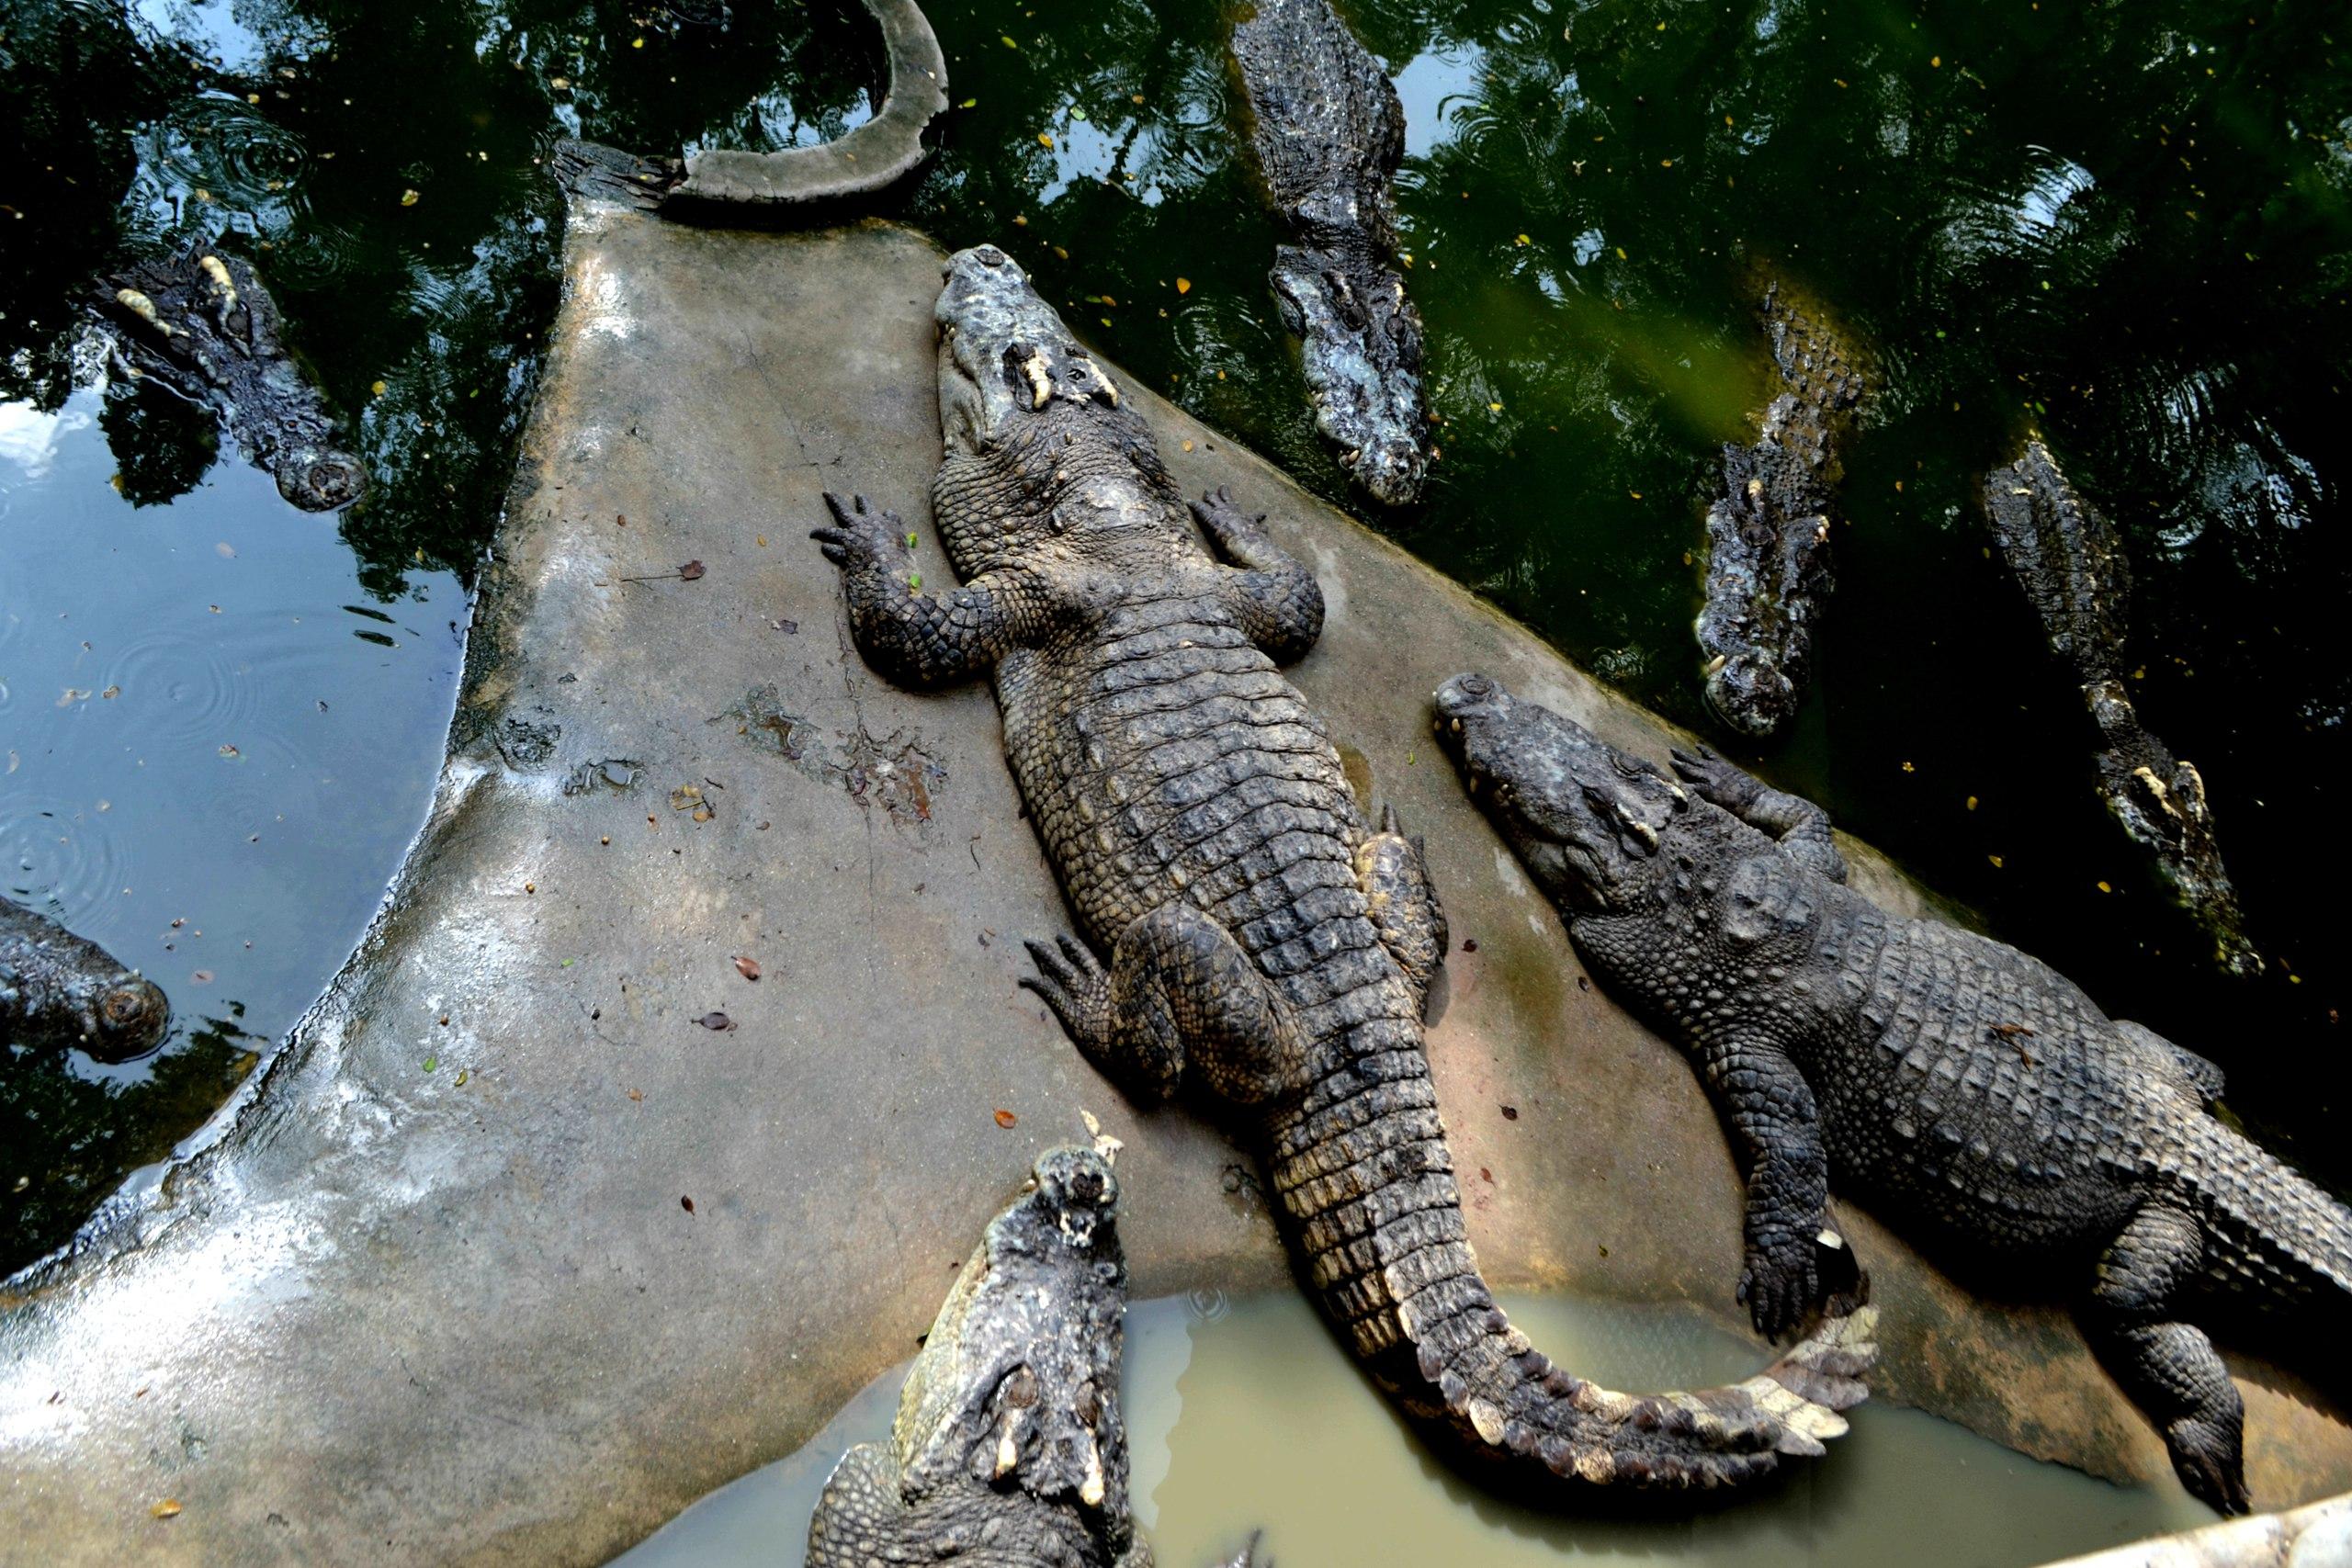 Елена Руденко ( Валтея ). Таиланд. Парк миллионолетних камней и крокодиловая ферма. B6gLk-i7GiQ